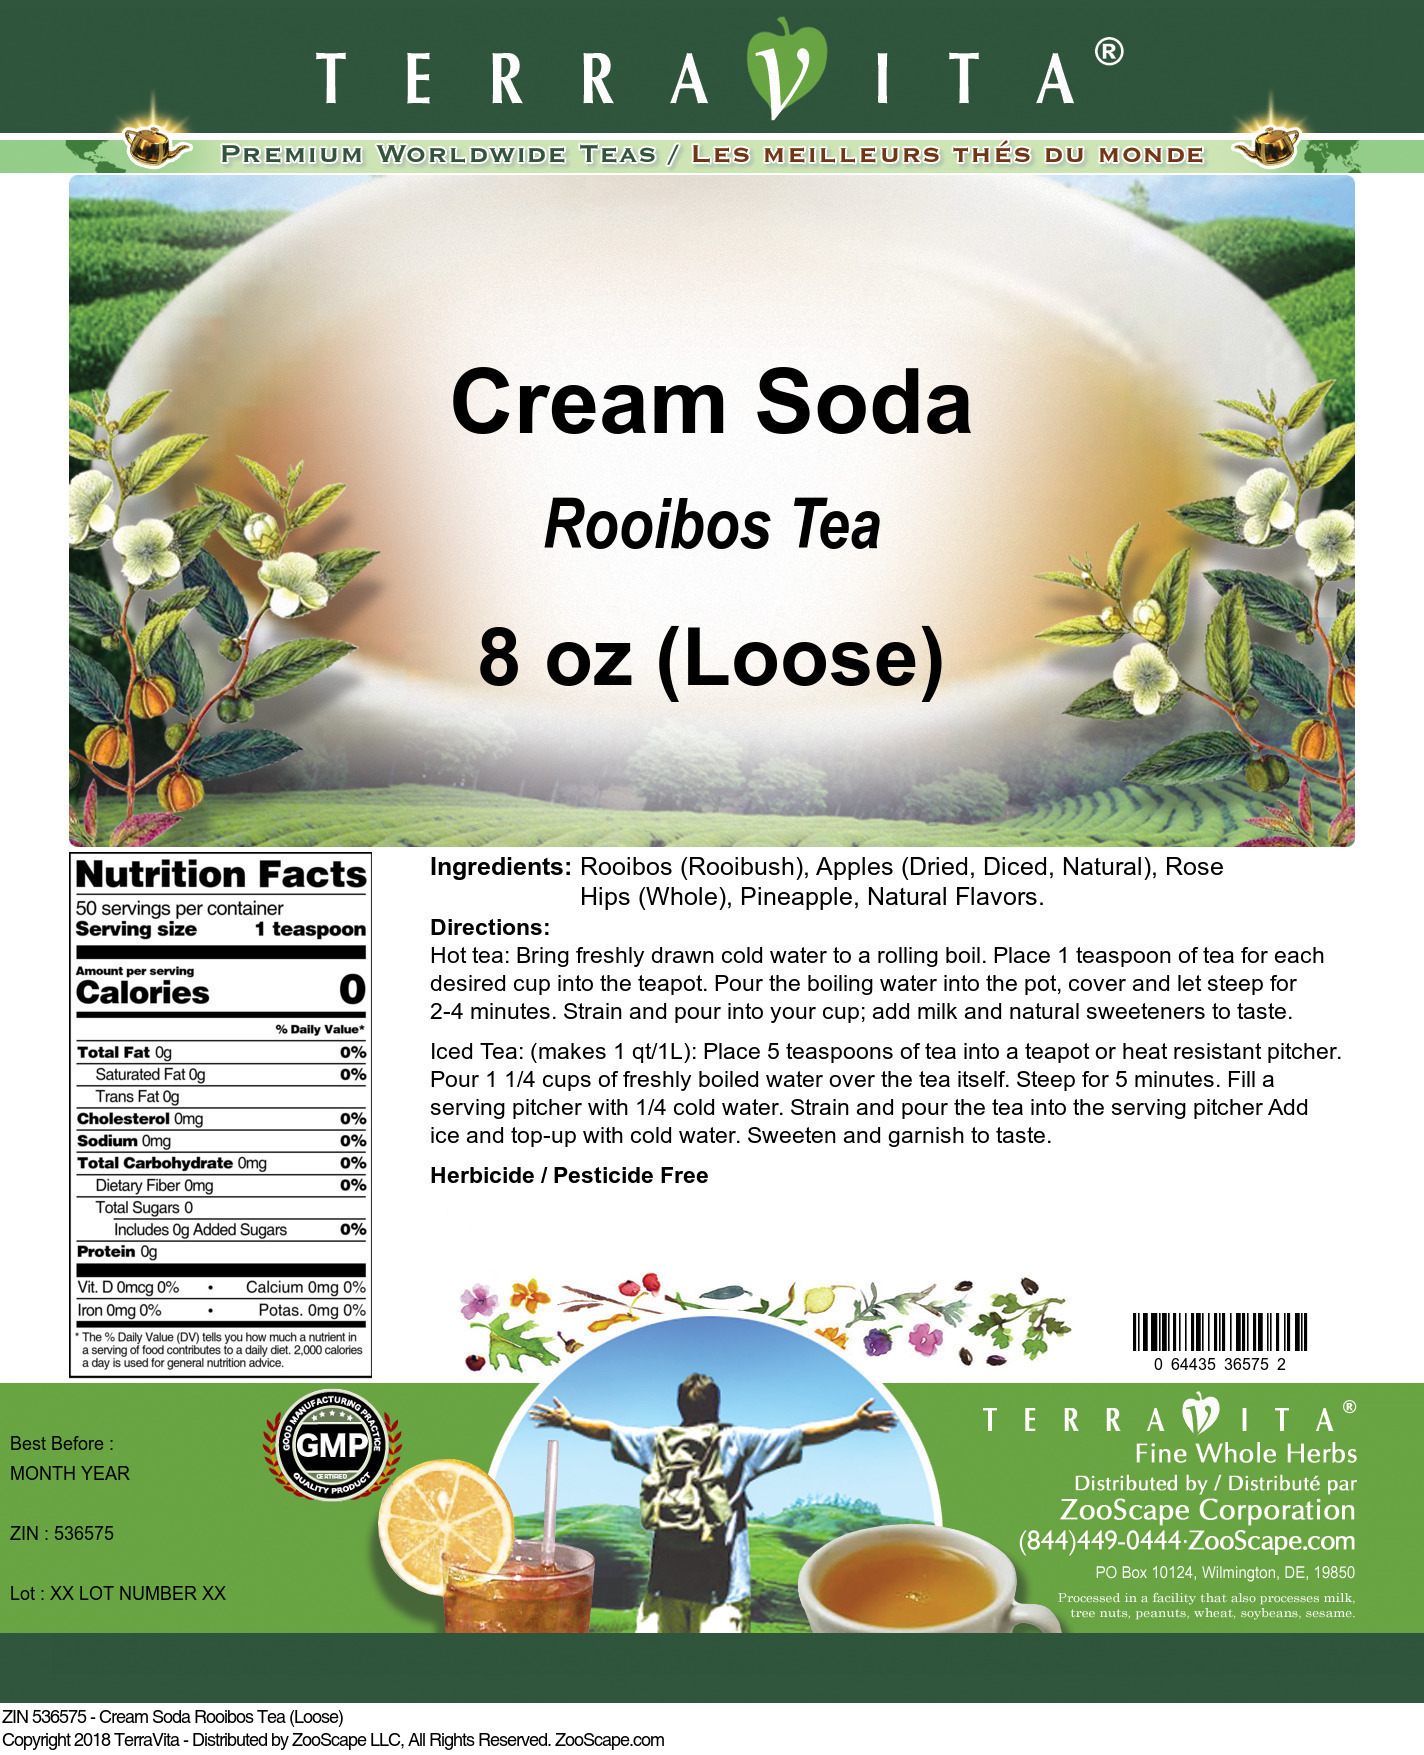 Cream Soda Rooibos Tea (Loose)